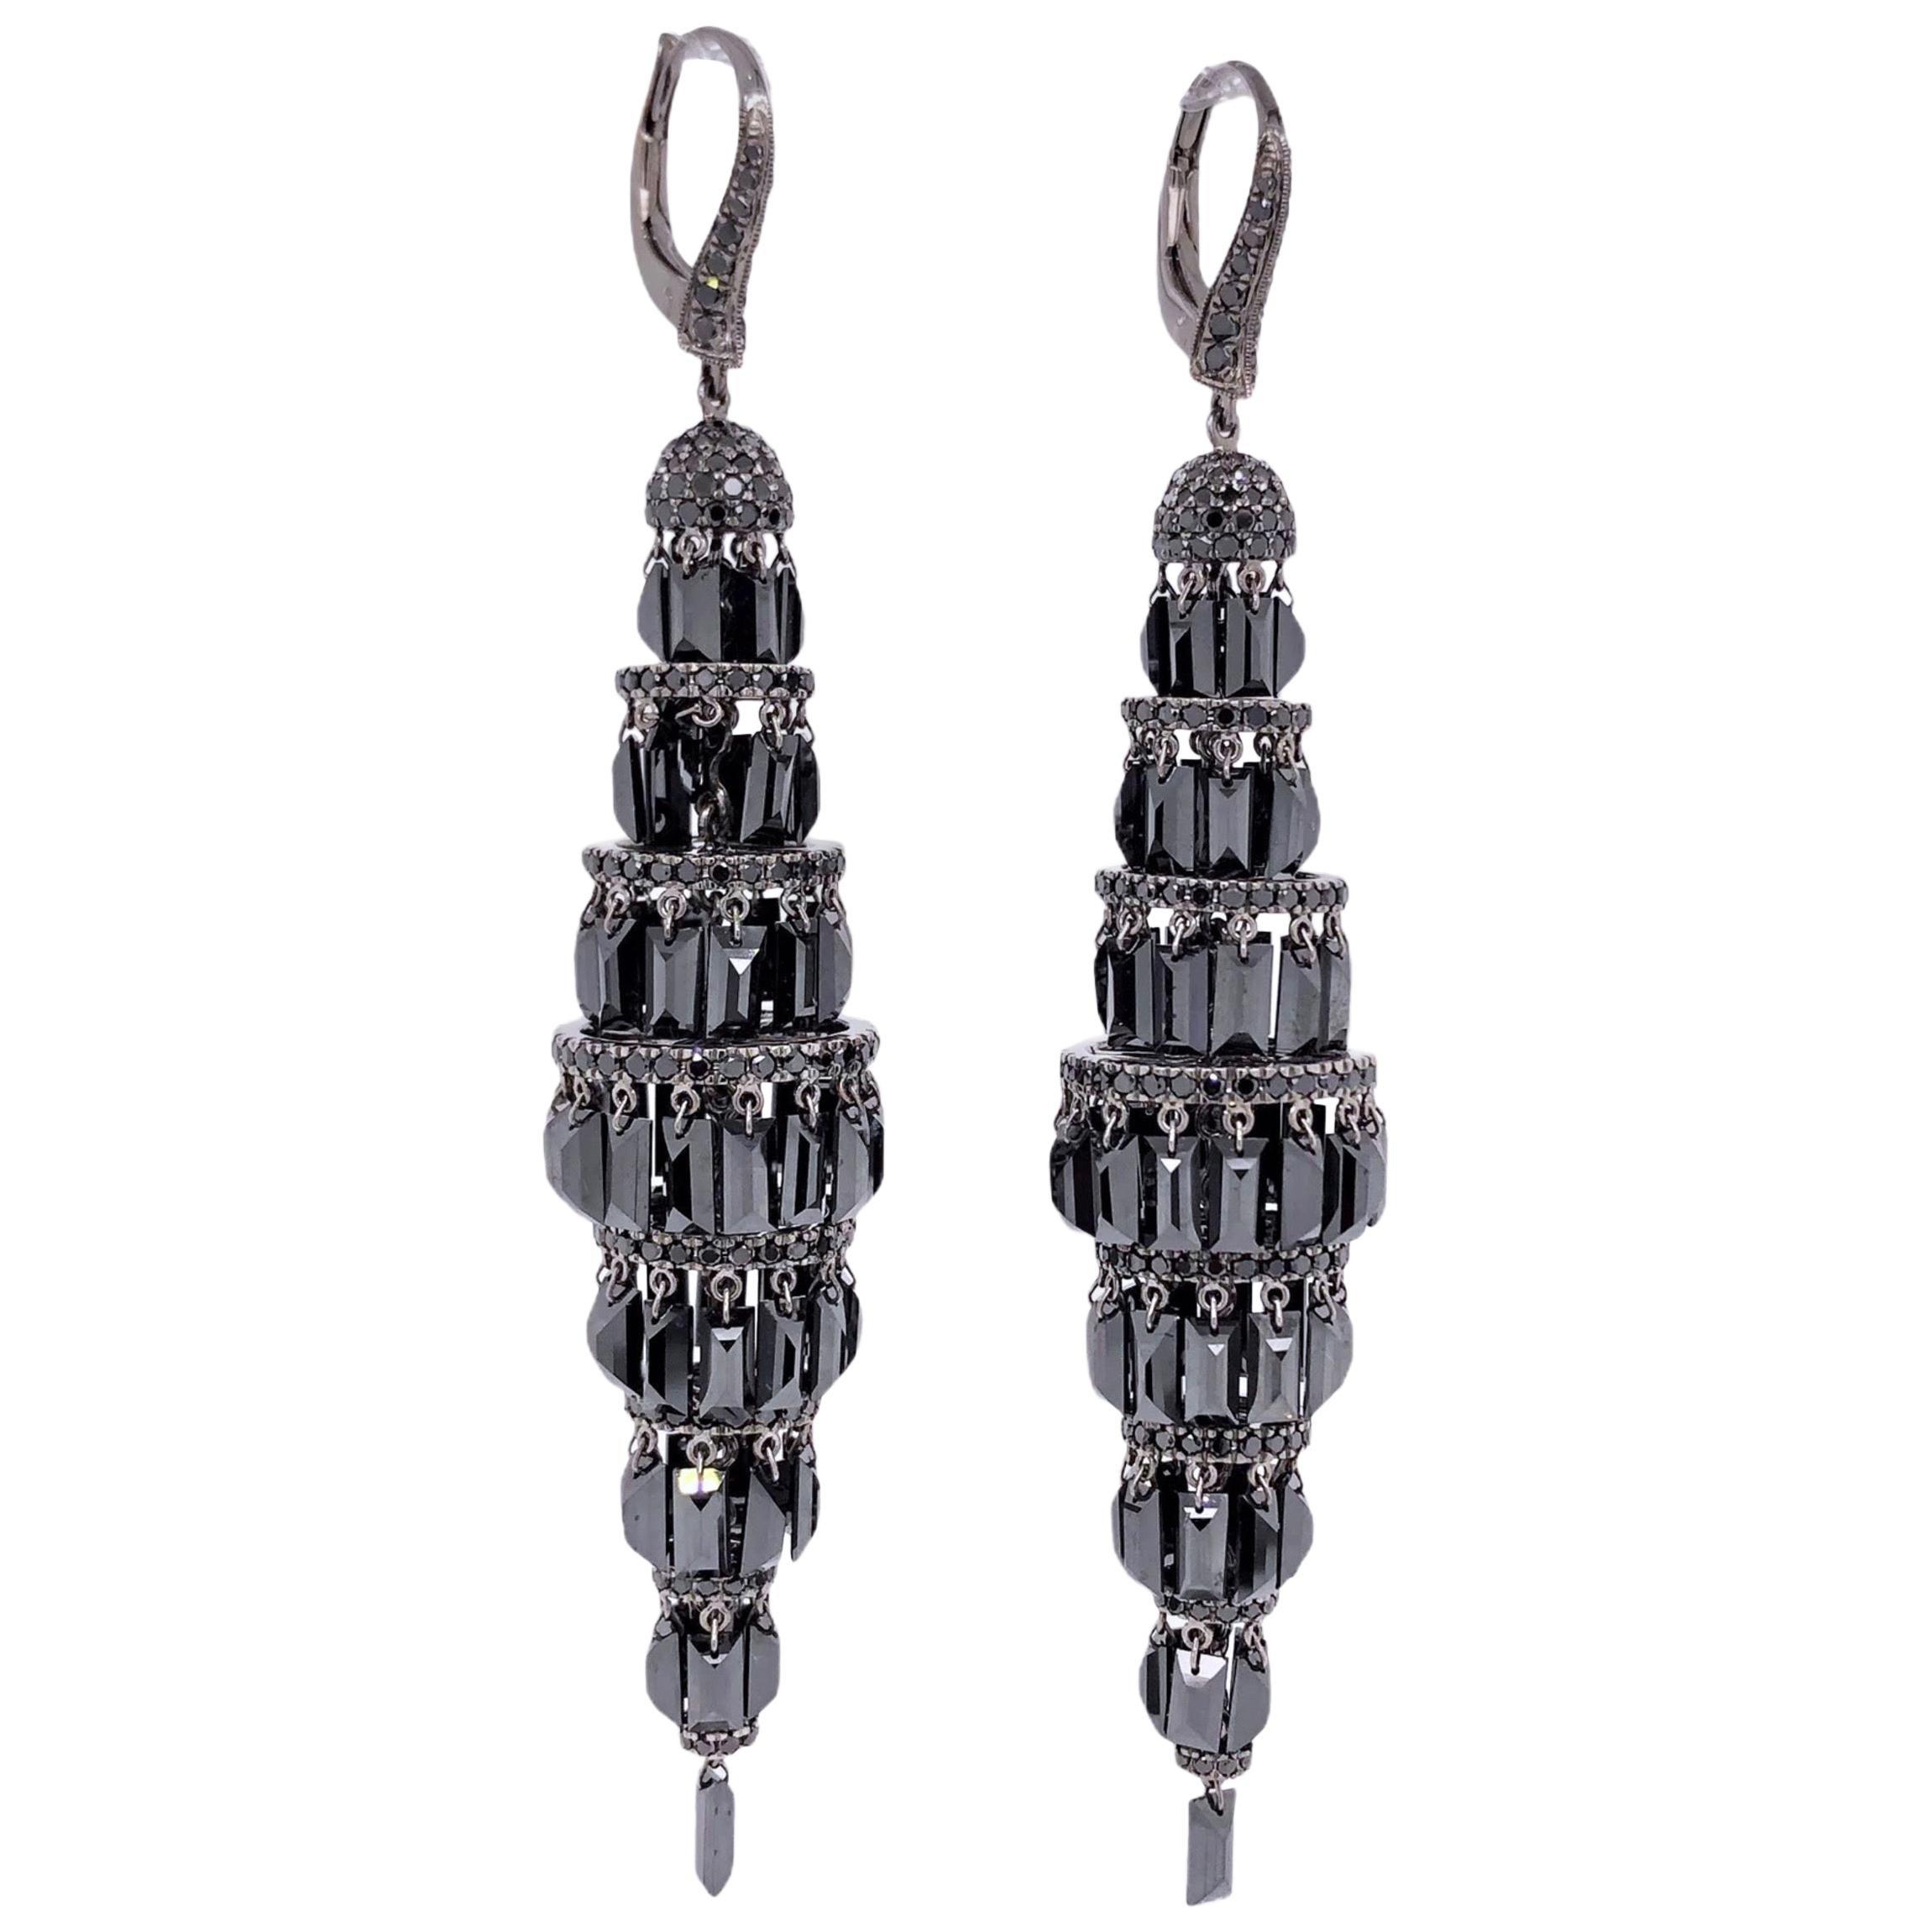 Paris Craft House Black Diamond Chandelier Earrings in 18 Karat Gold